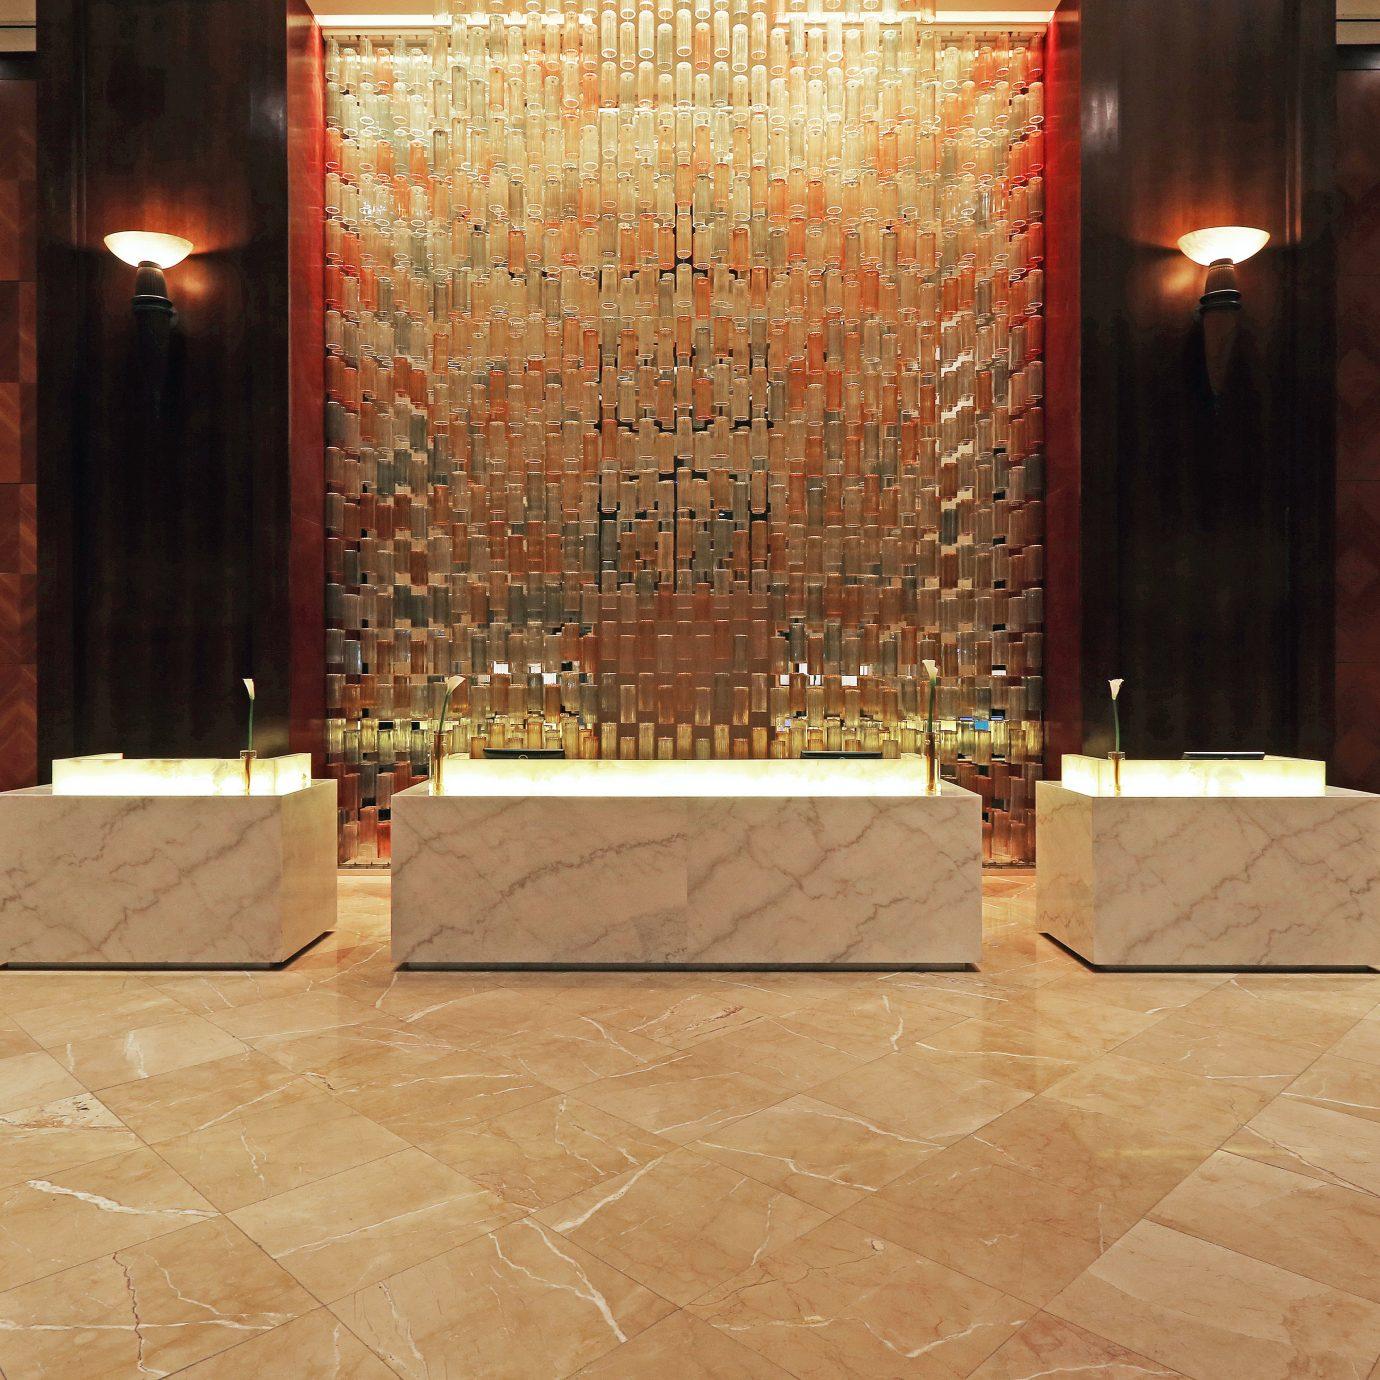 City Classic Resort flooring Lobby building hardwood wood flooring tile laminate flooring material stone